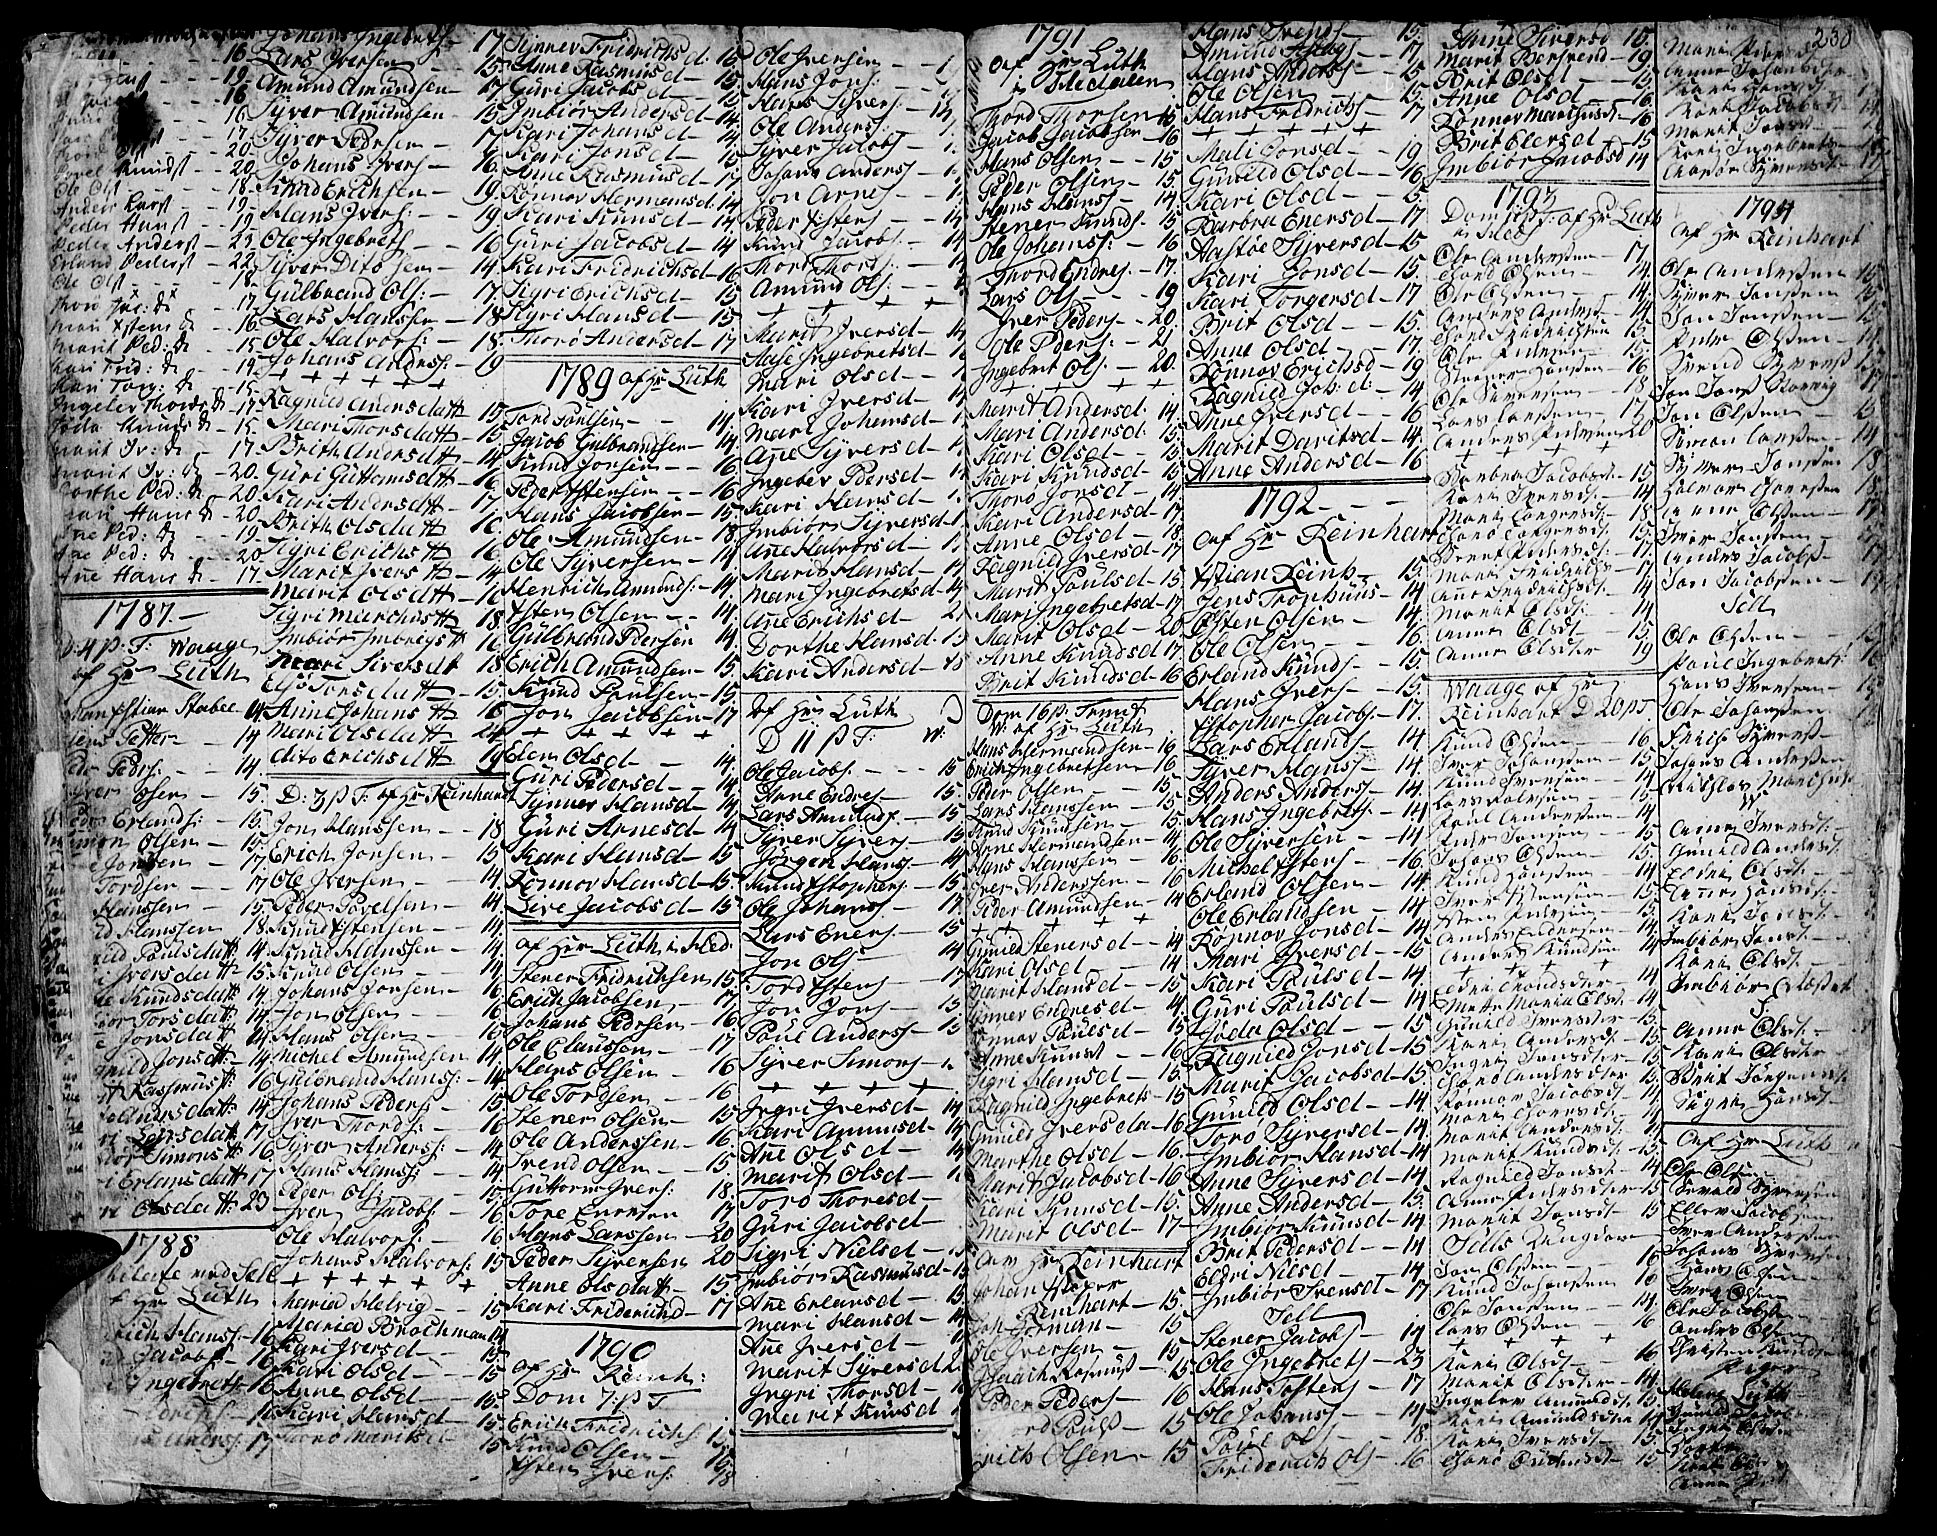 SAH, Vågå prestekontor, Ministerialbok nr. 1, 1739-1810, s. 230